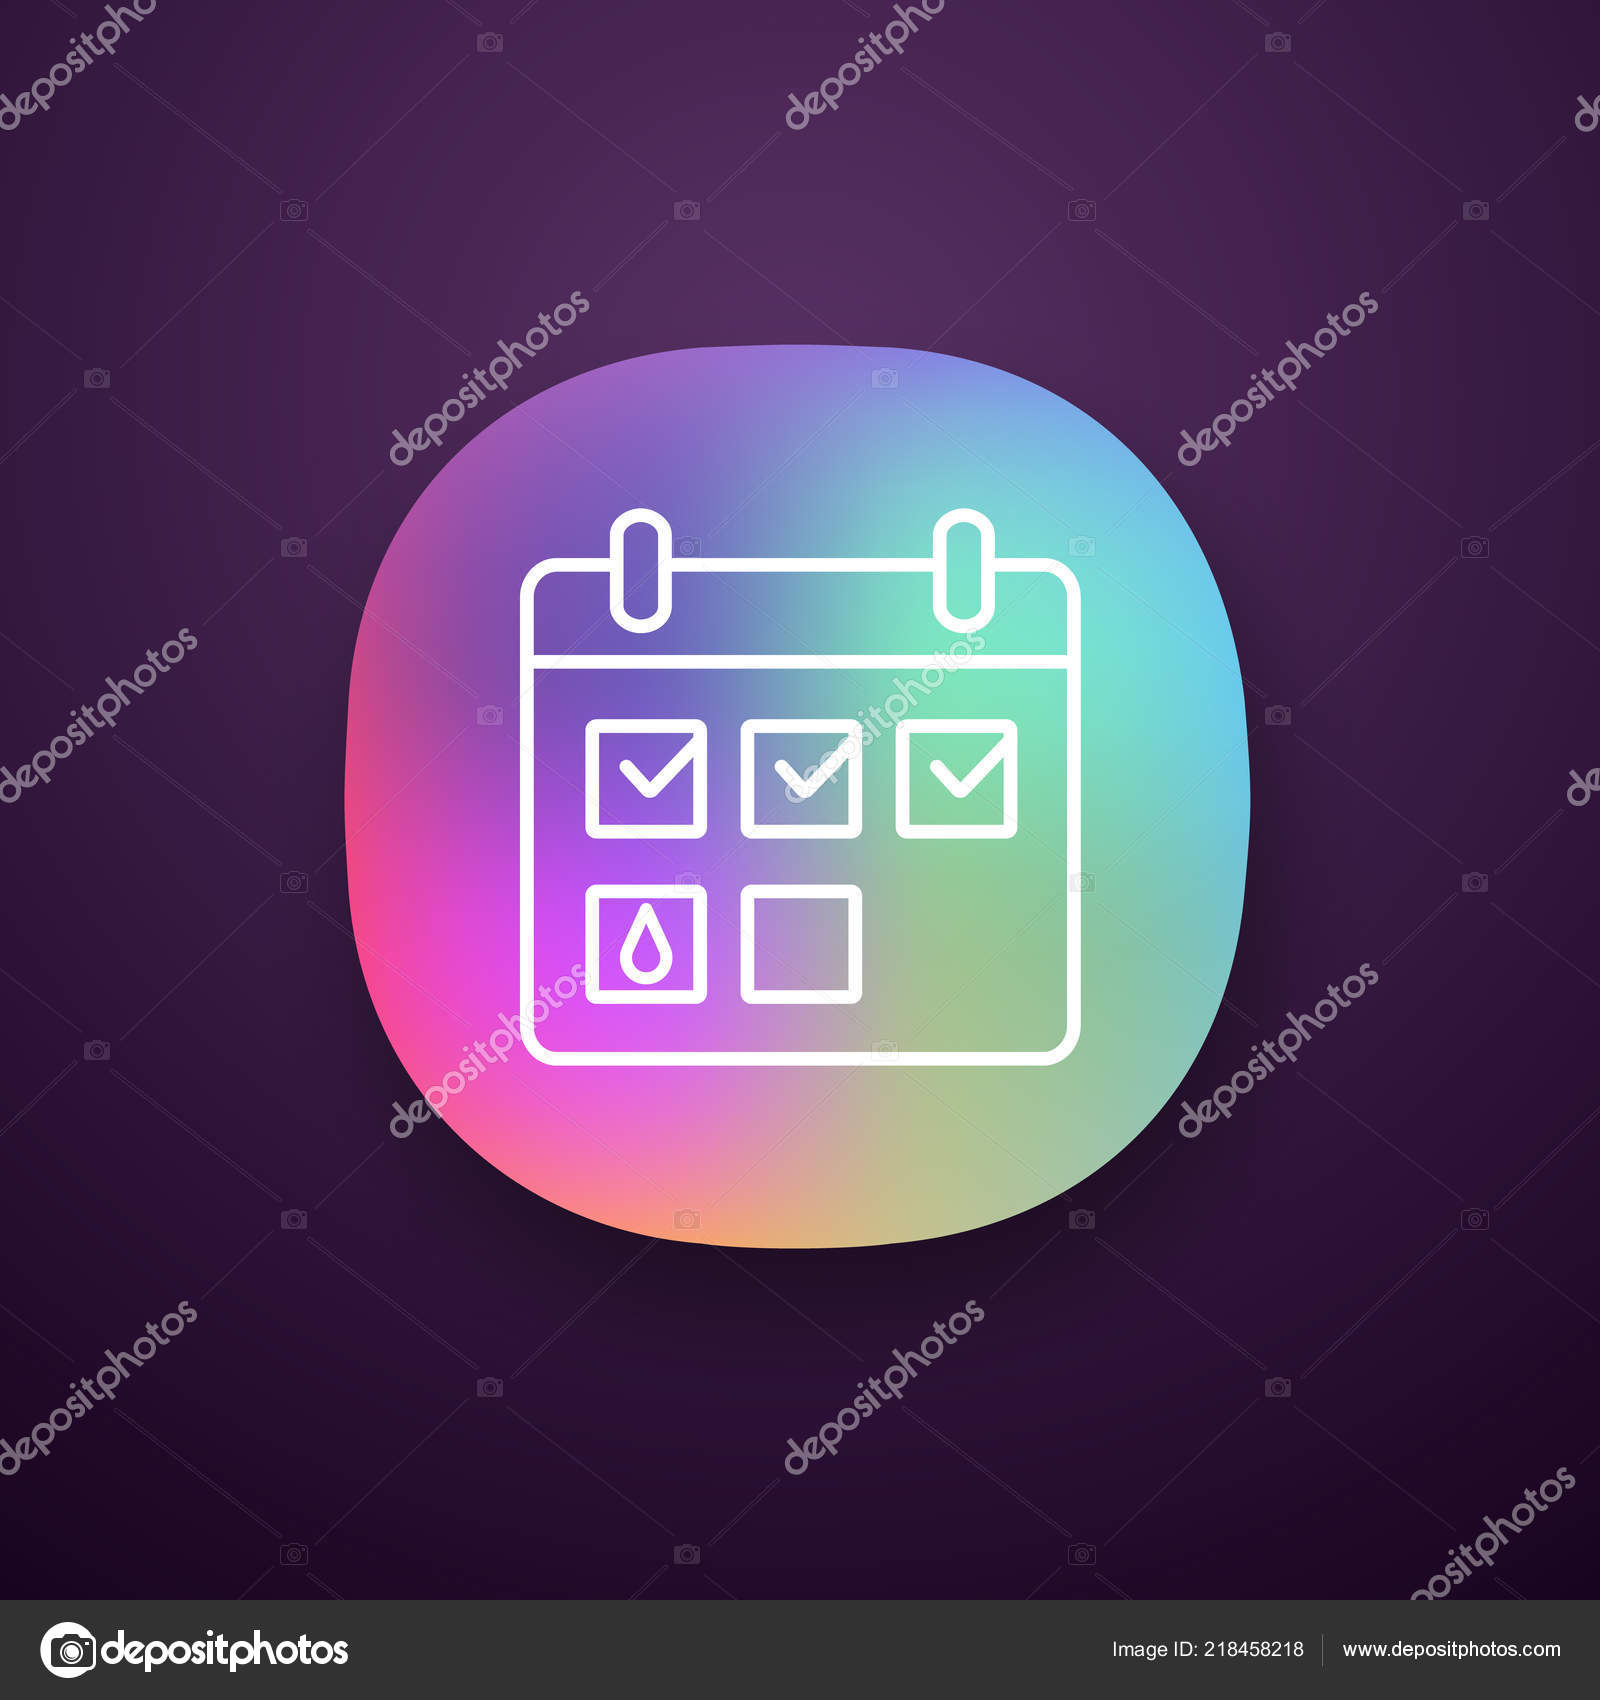 Aplicacion Calendario Menstrual.Icono Aplicacion Calendario Menstrual Perseguidor Del